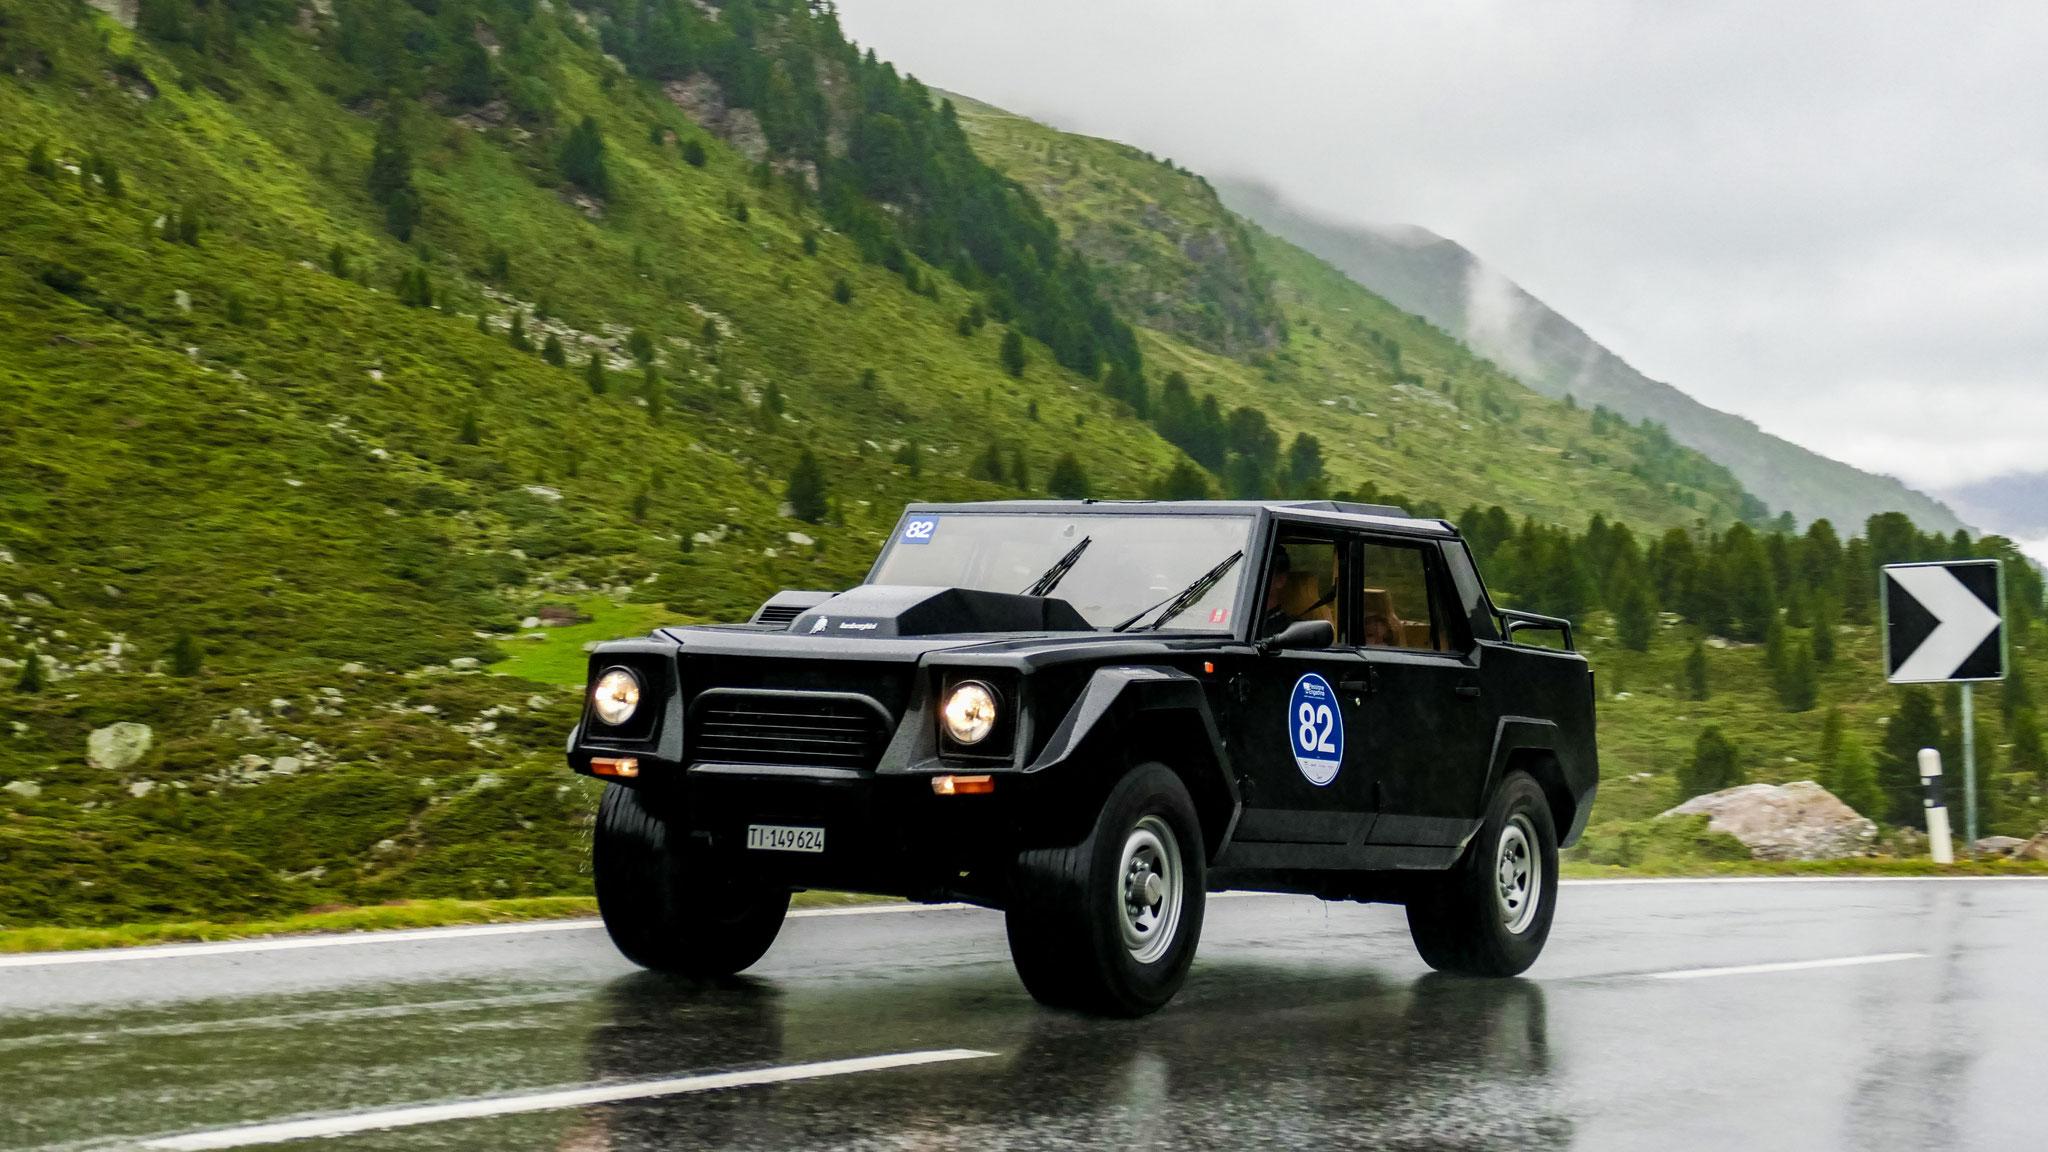 Lamborghini LM002 - TI-159624 (CH)